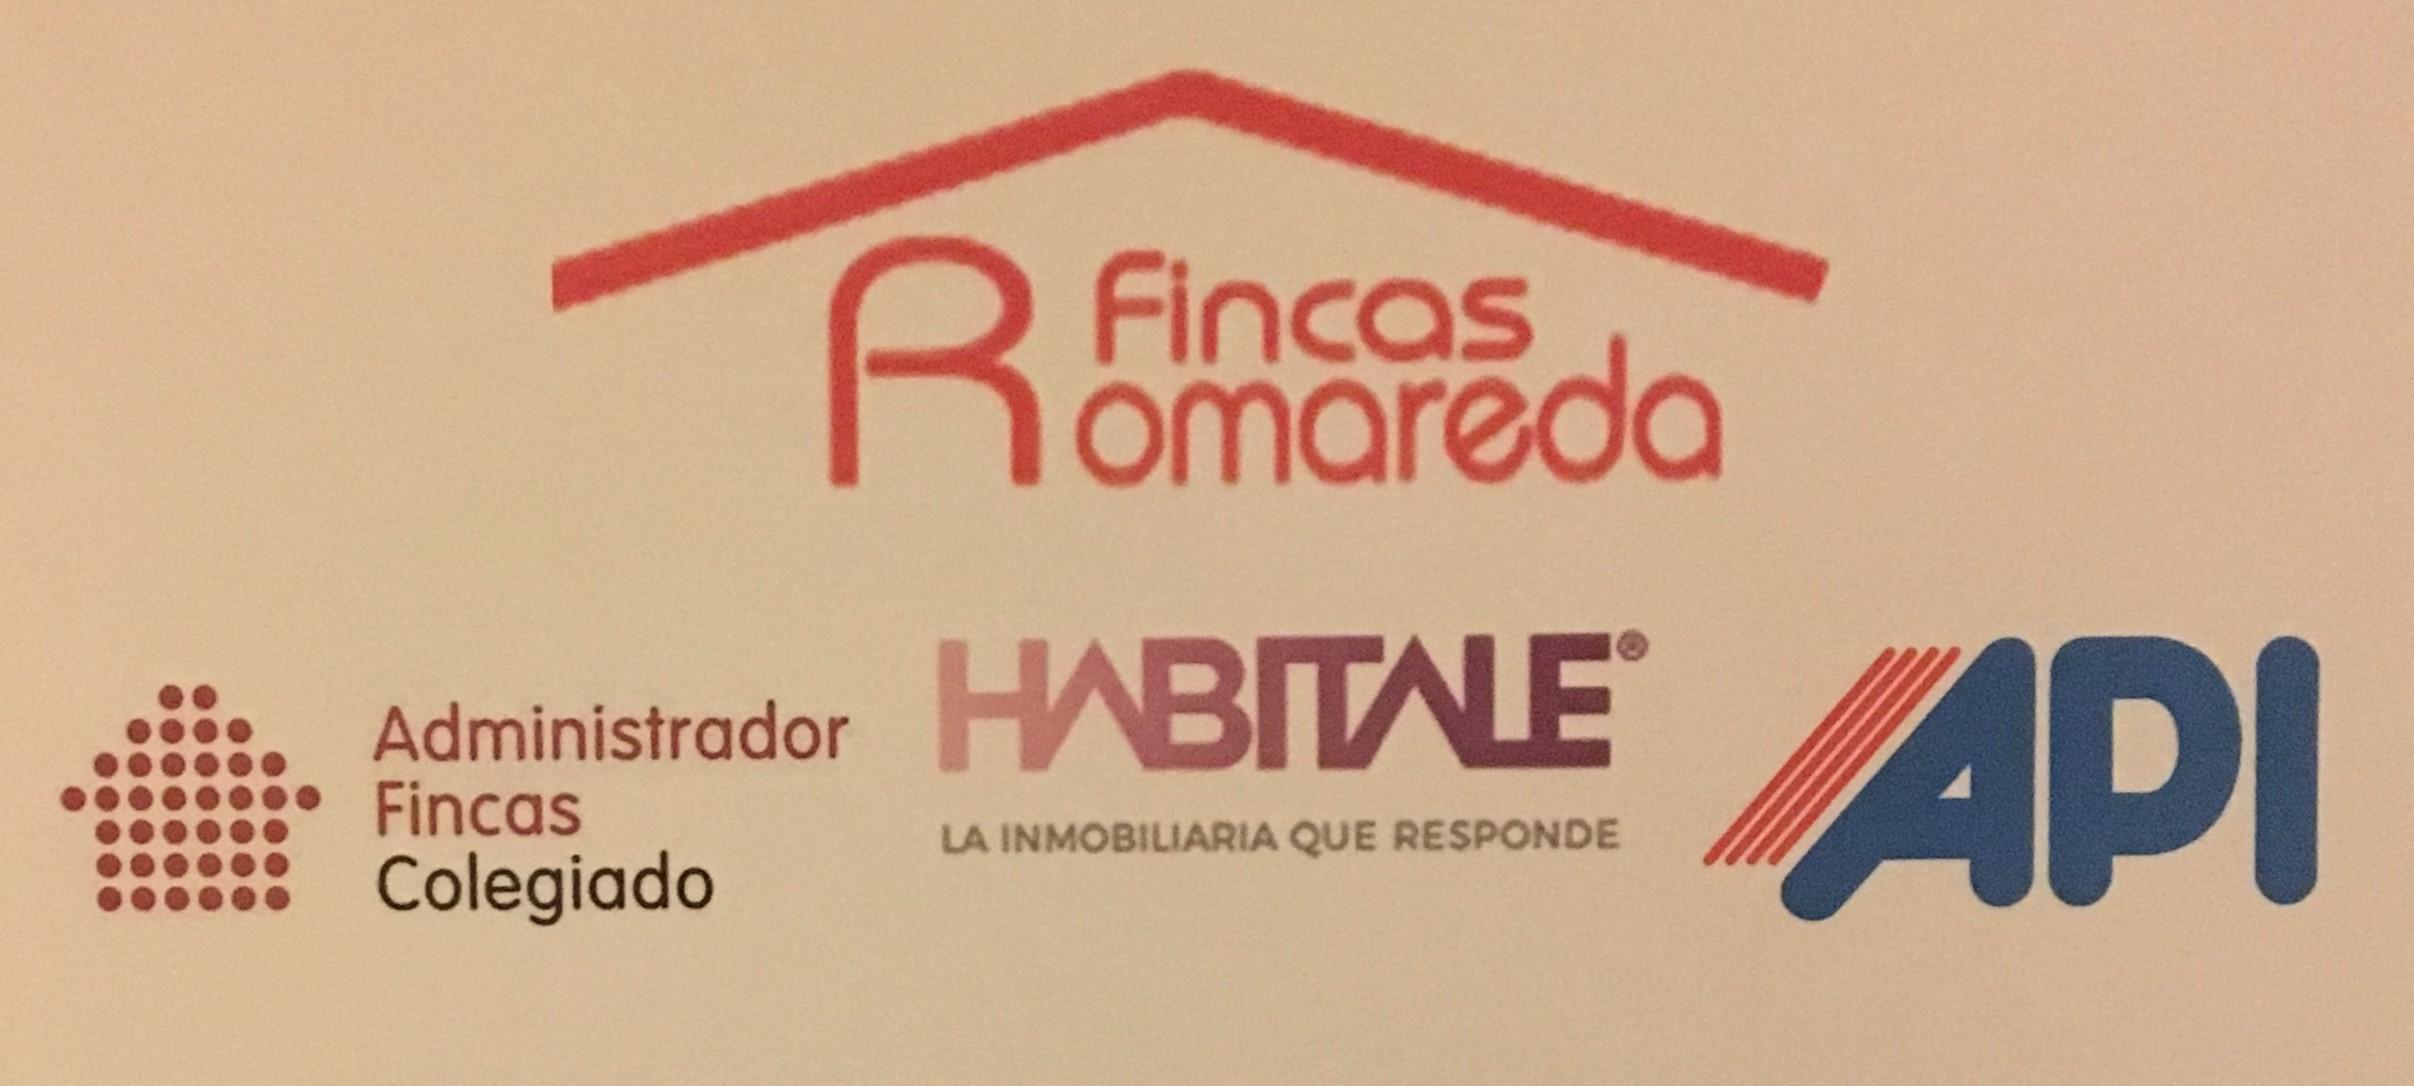 Fincas Romareda